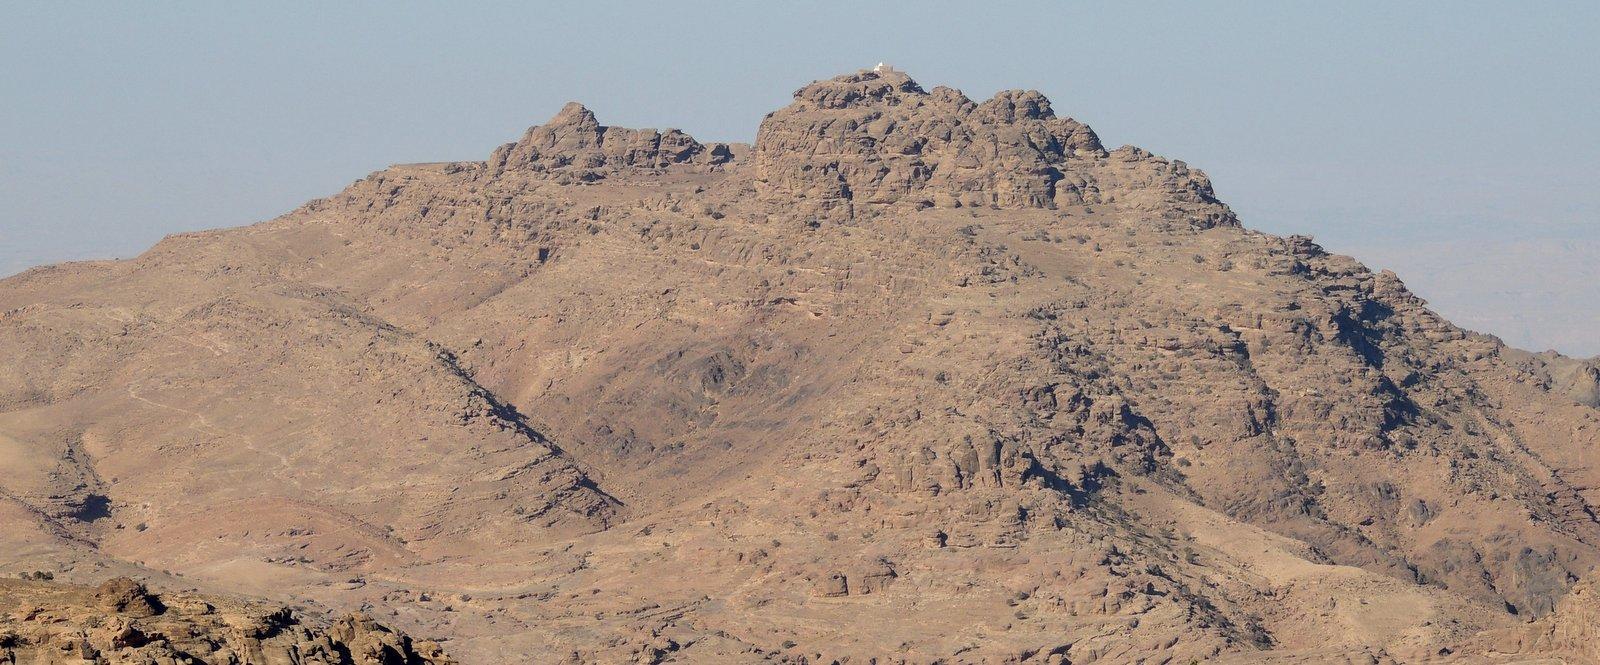 Berg Hor Jordanien